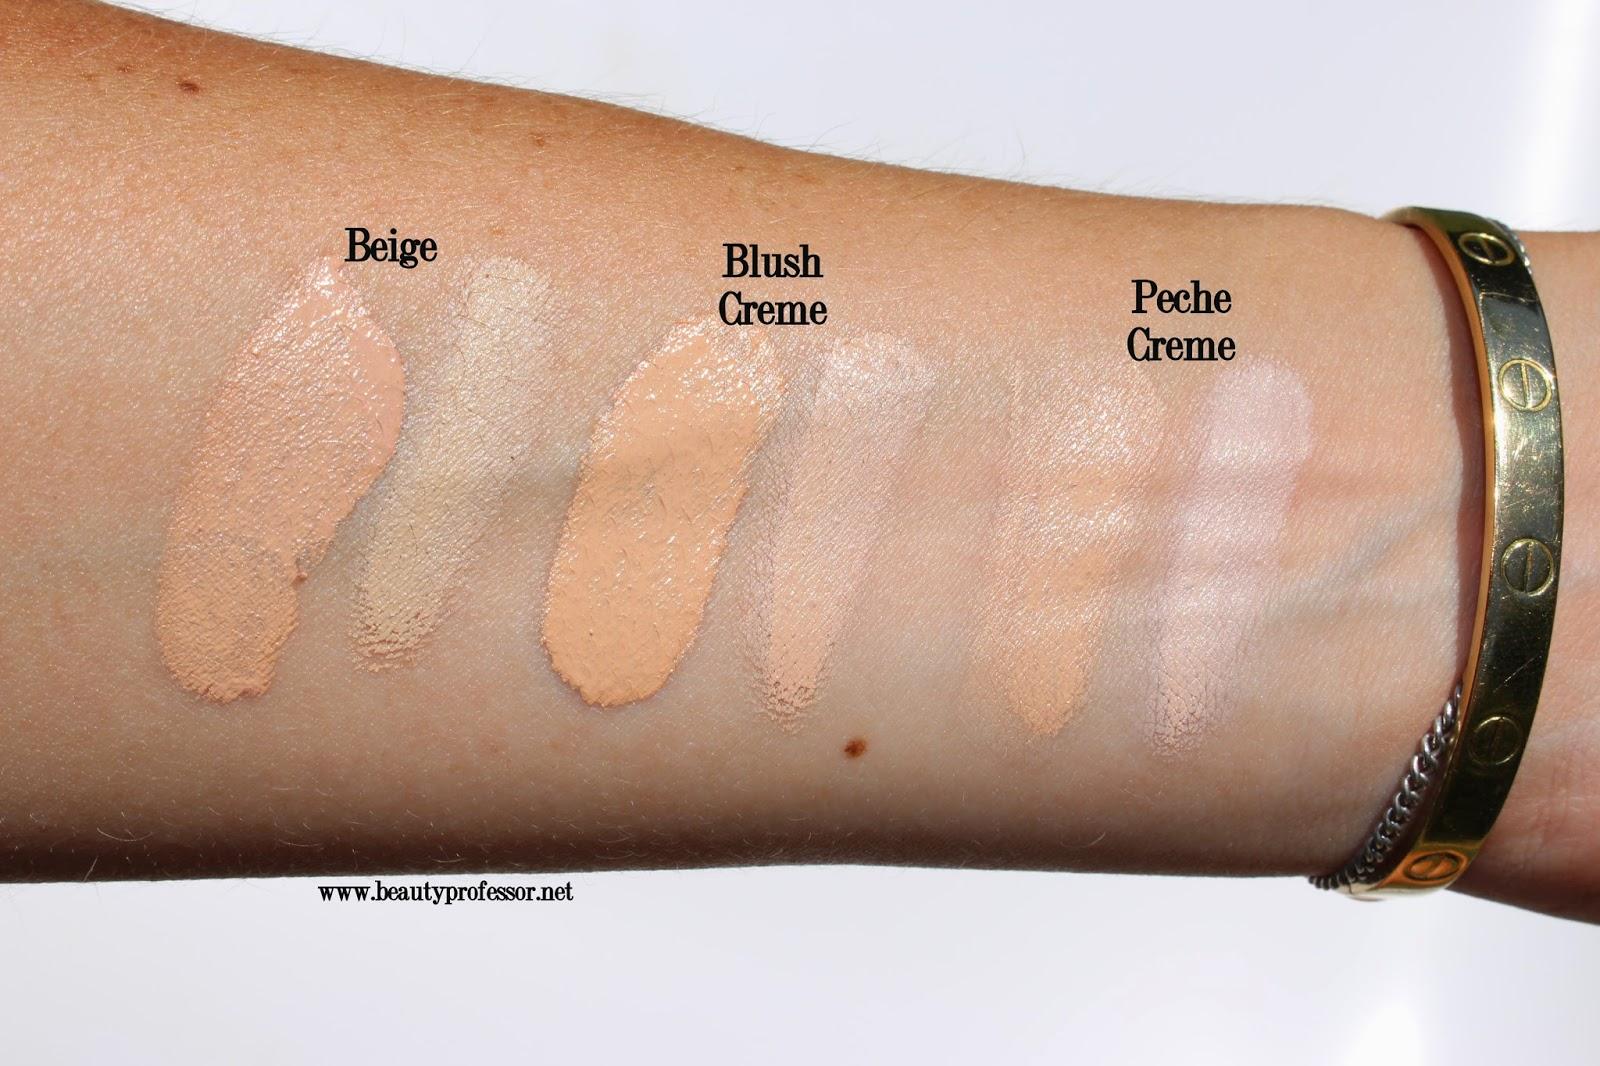 Cellular Treatment Powder Blush by la prairie #3